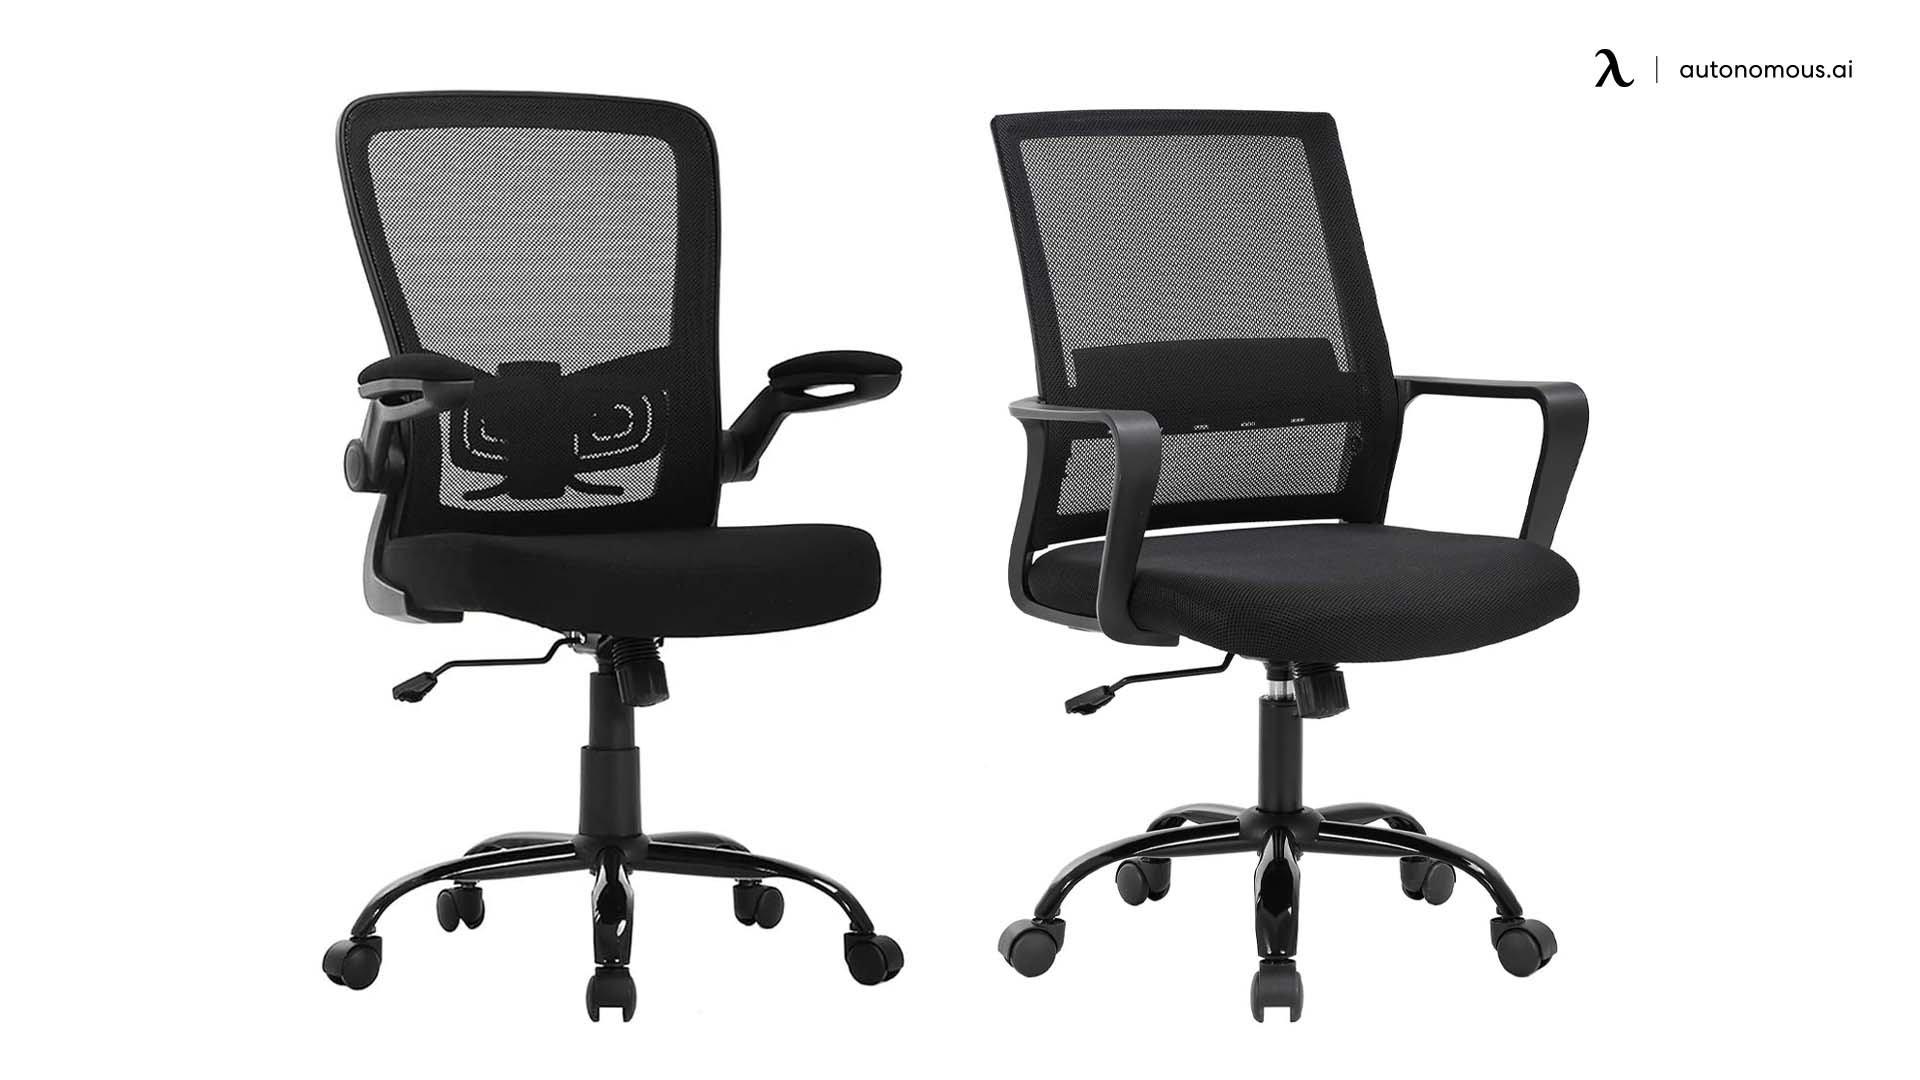 Ergonomic Mesh Desk Chair by BestOffice